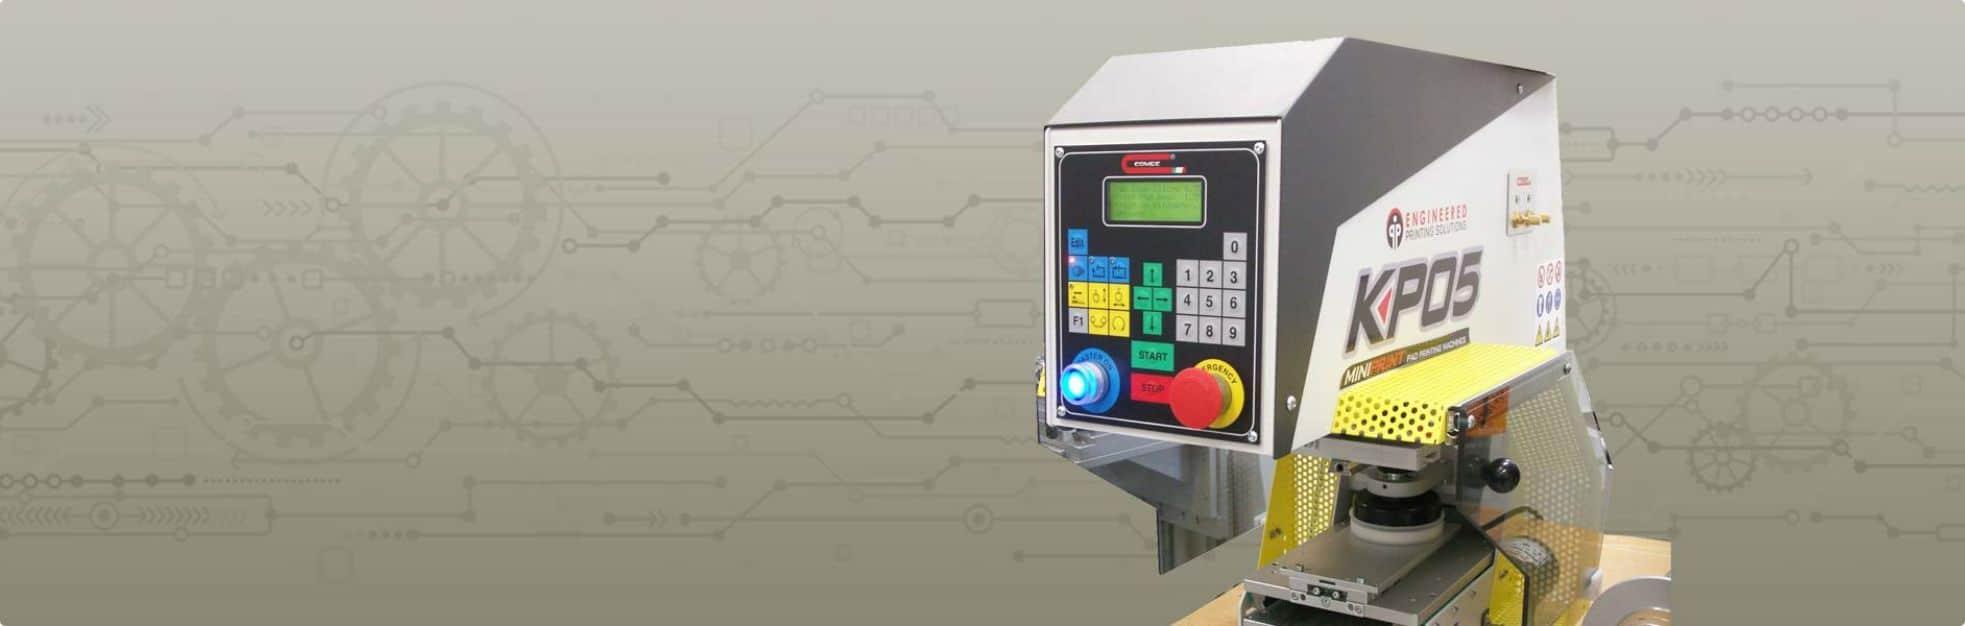 KP05 Pad Printing Machine